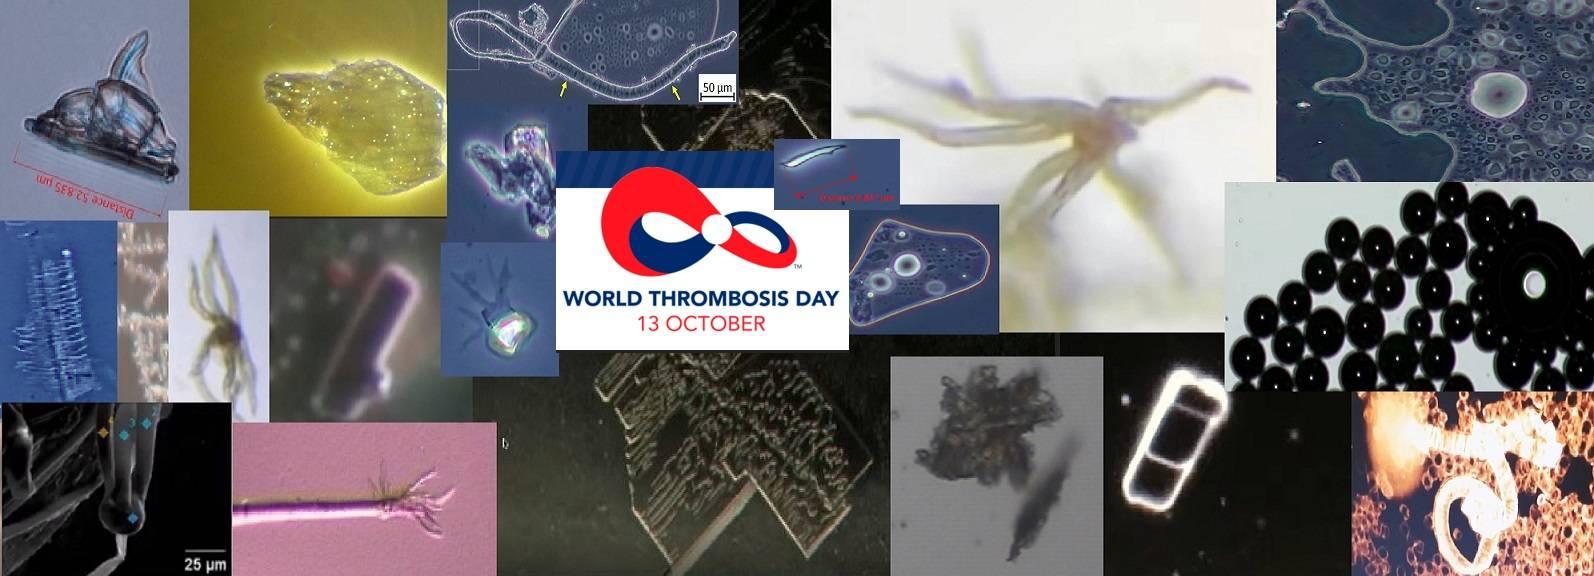 https://www.burbuja.info/inmobiliaria/attachments/vacunas-imagenes-laboratorio-microscopio-optico-recop-jpg.806222/